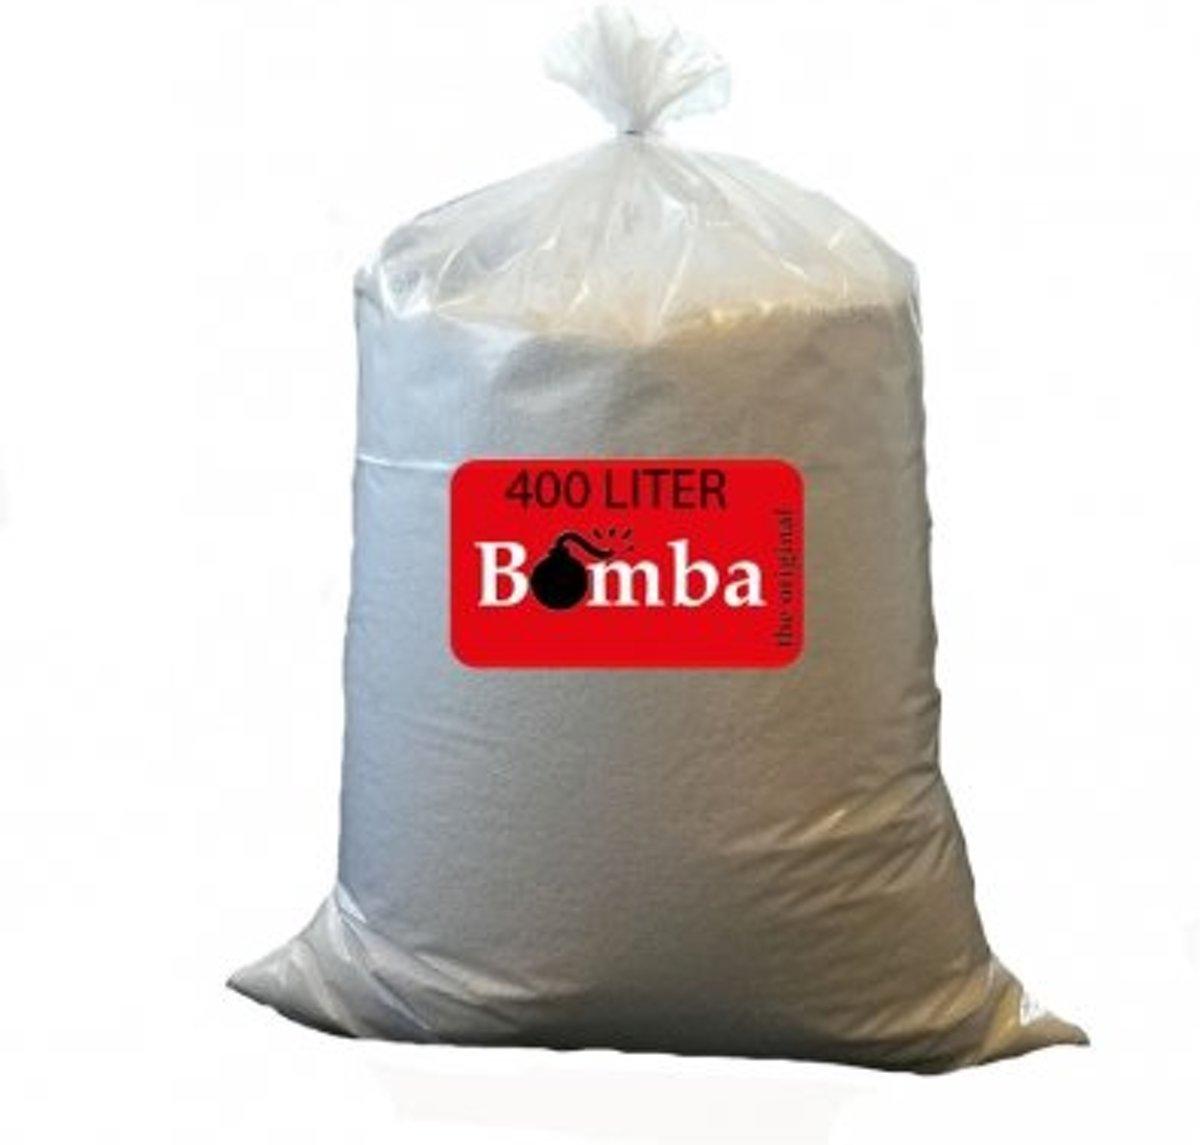 Bomba EPS zitzak vulling zitzakvulling 400 ltr. kopen